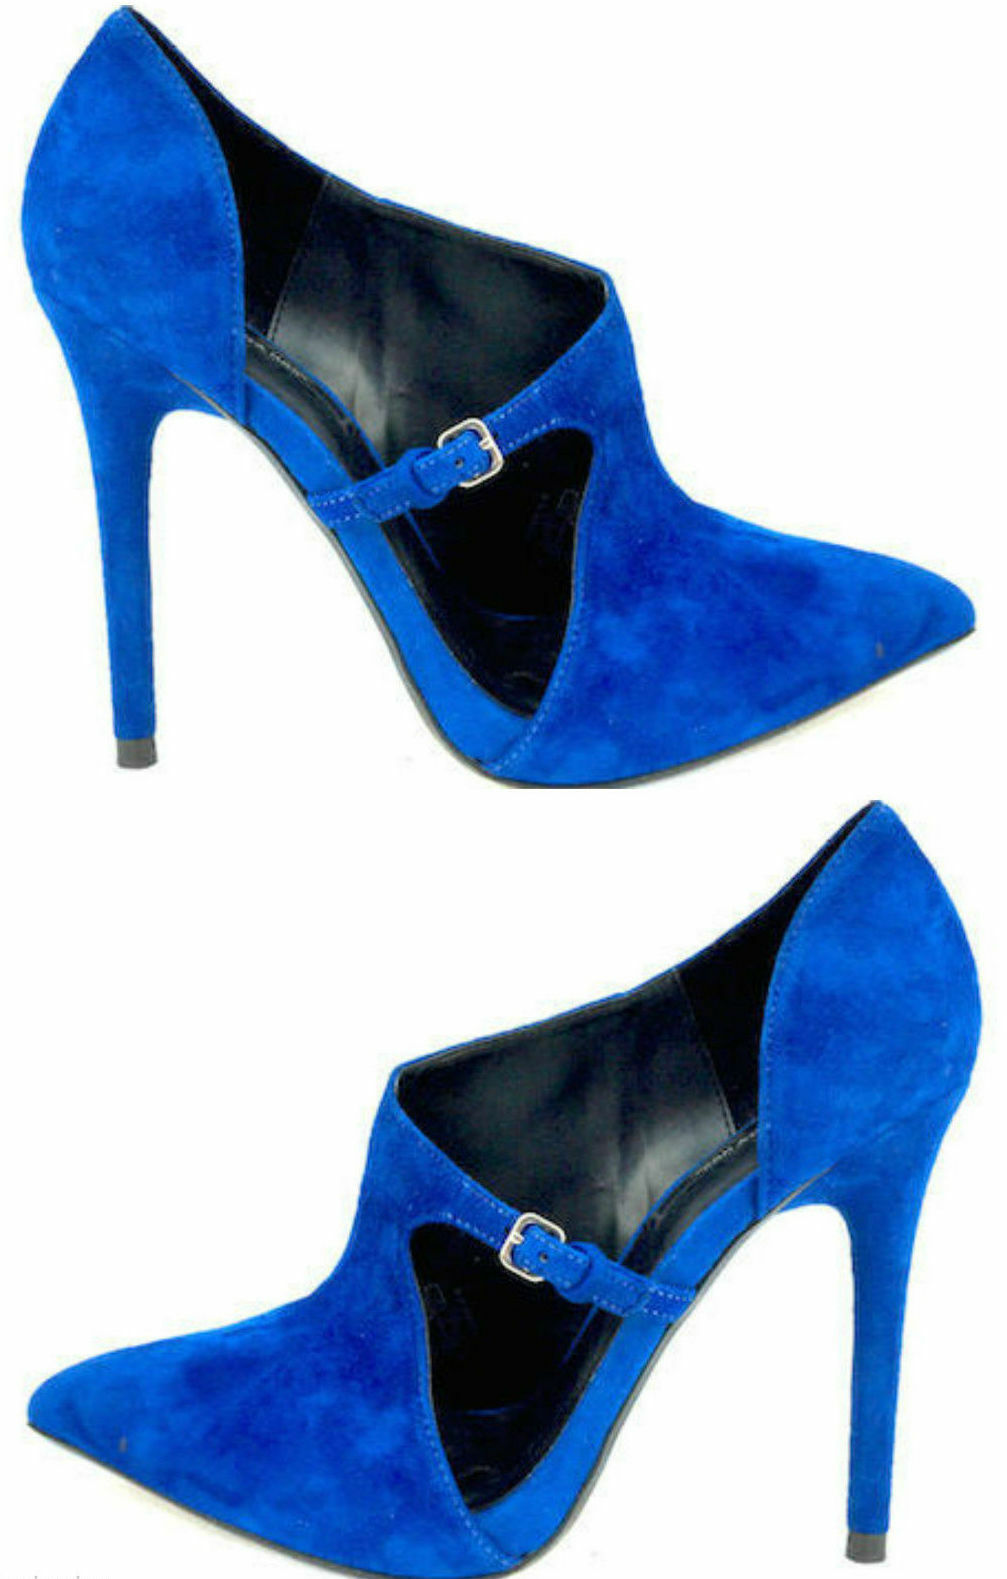 NWT ZARA blueE blueE blueE HIGH HEEL SUEDE LEATHER POINTED TOE BOOTIE PUMPS 6235 301 US 6 442155